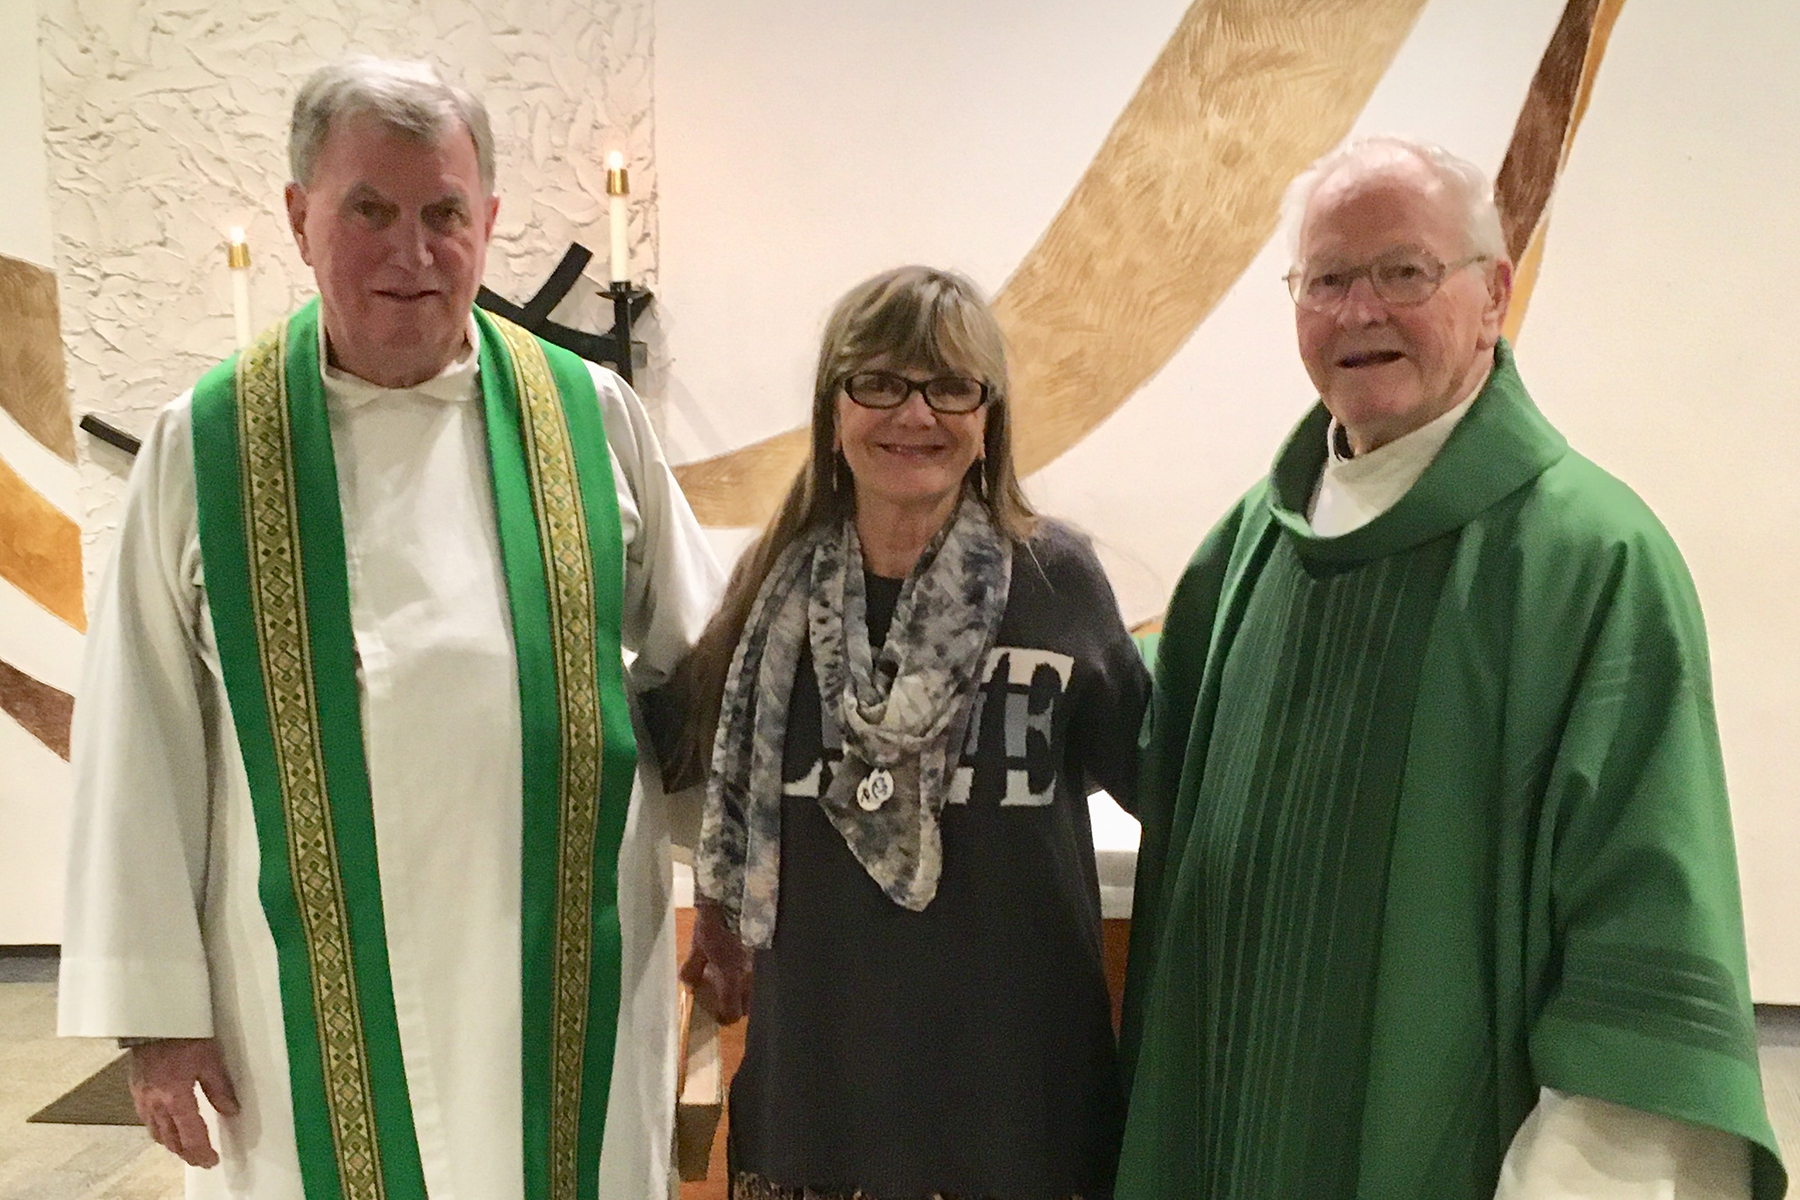 Fr. Dennis Doyle, Diana Gorham, and Fr. Al McMenamy